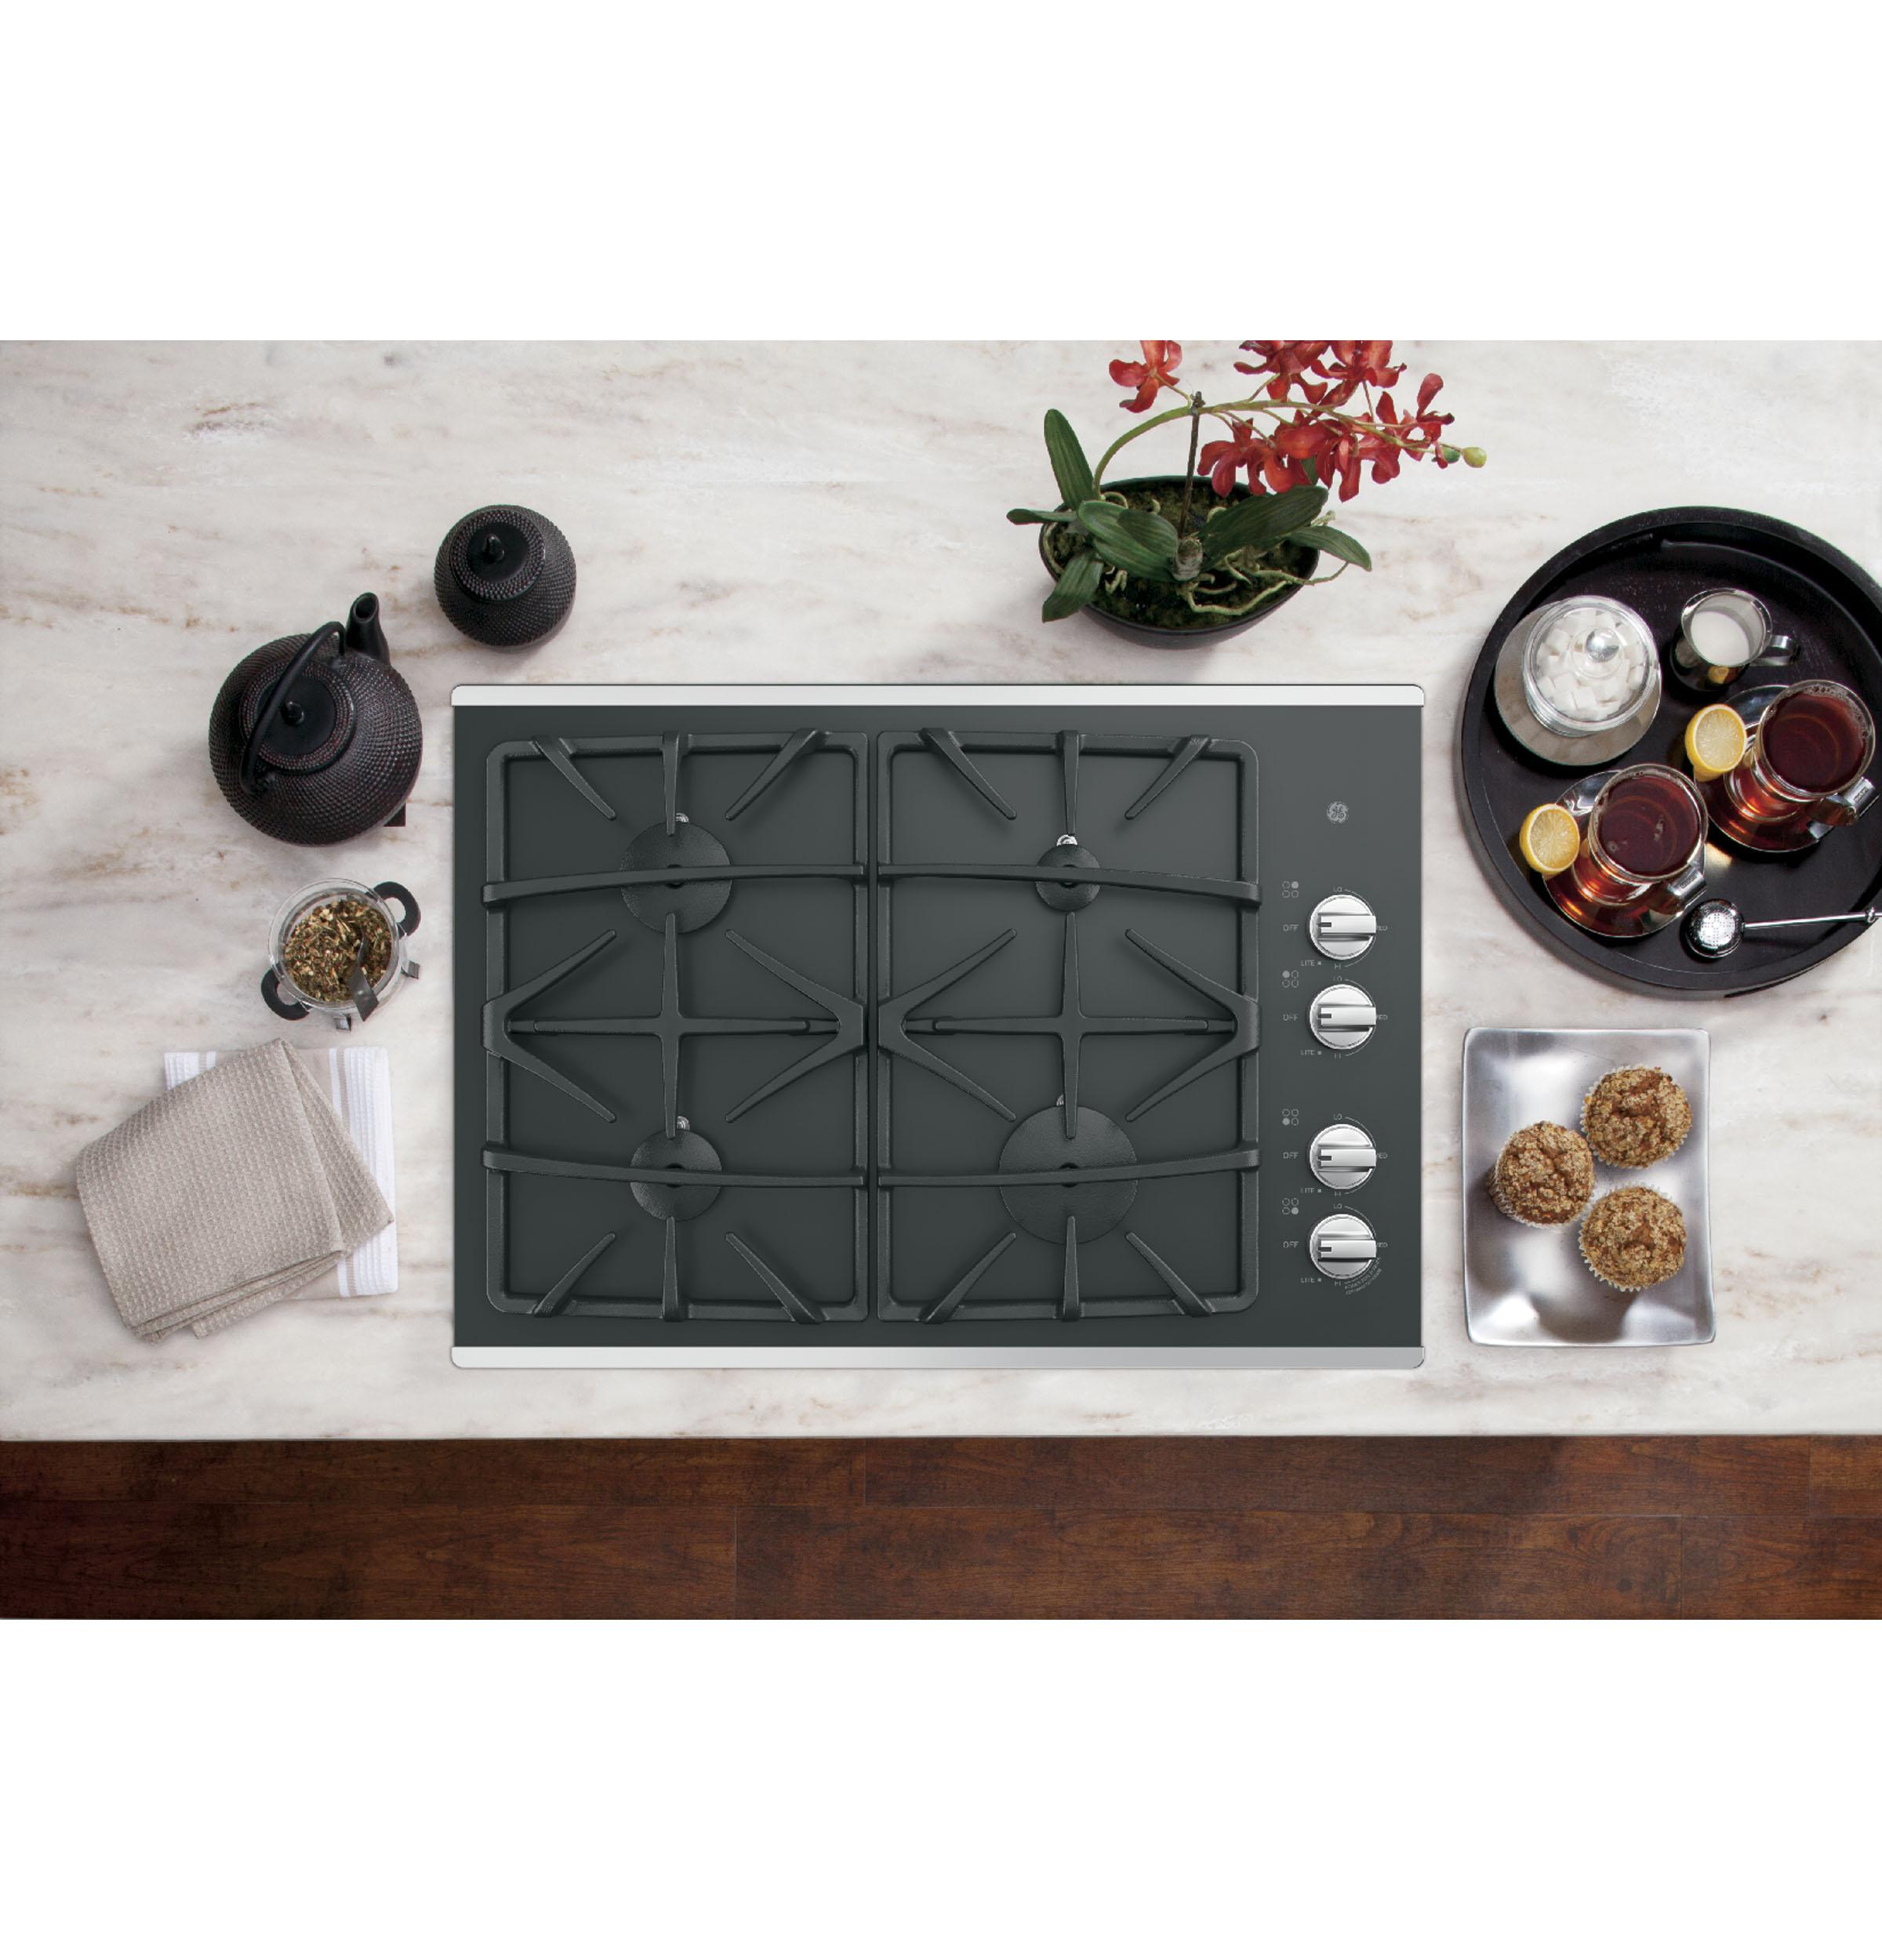 "Model: JGP5530SLSS | GE GE® 30"" Built-In Gas on Glass Cooktop with Dishwasher Safe Grates"